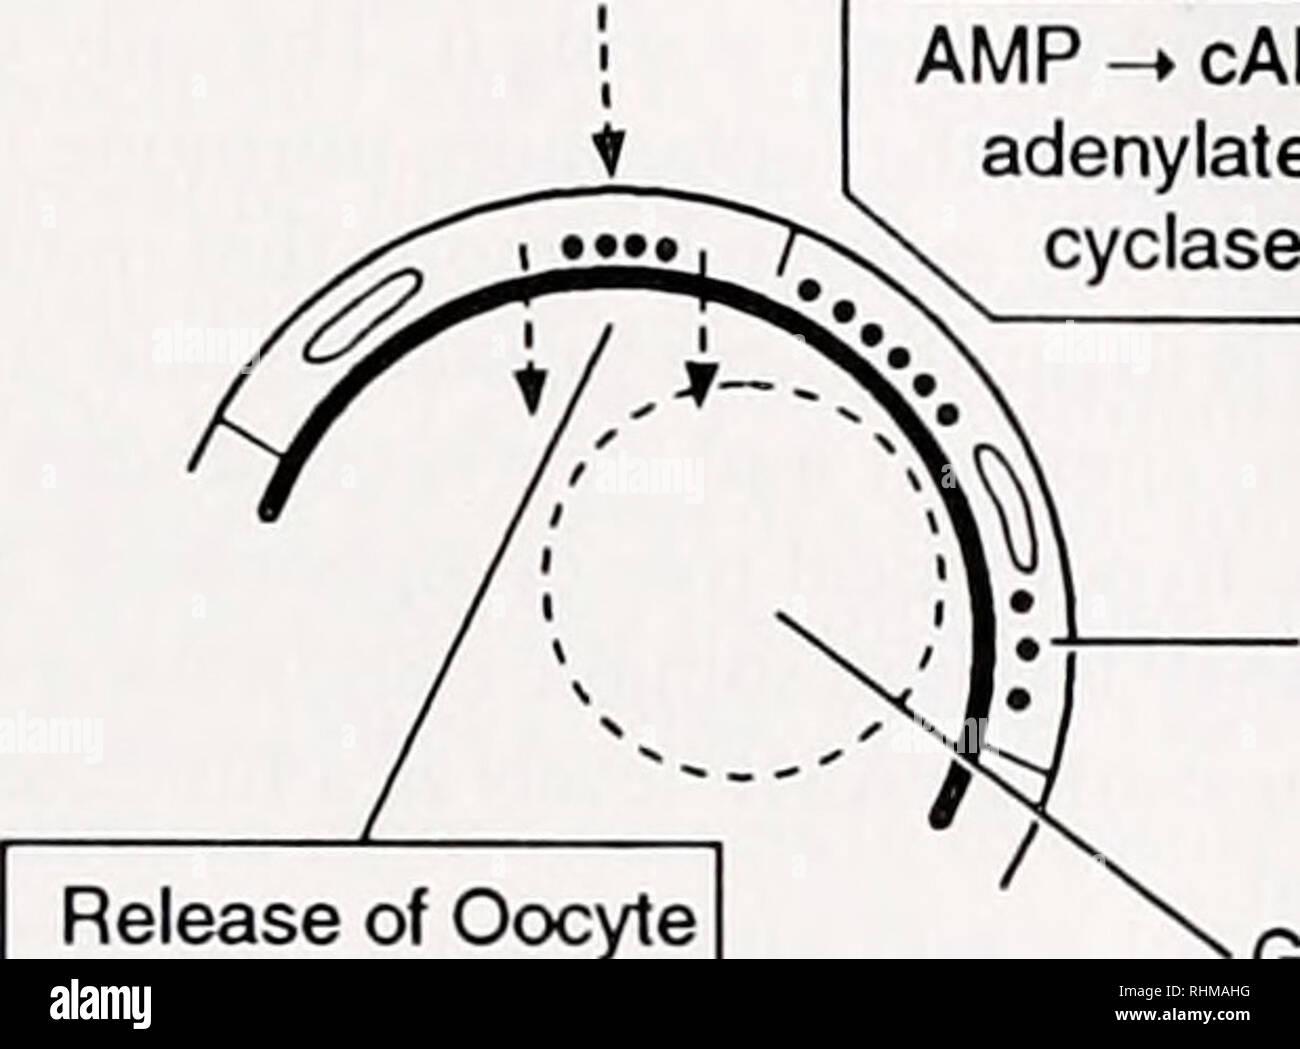 wiring diagram rheem xe10p06pu20uo amp diagram biology main giant rundumpodcast de  amp diagram biology main giant